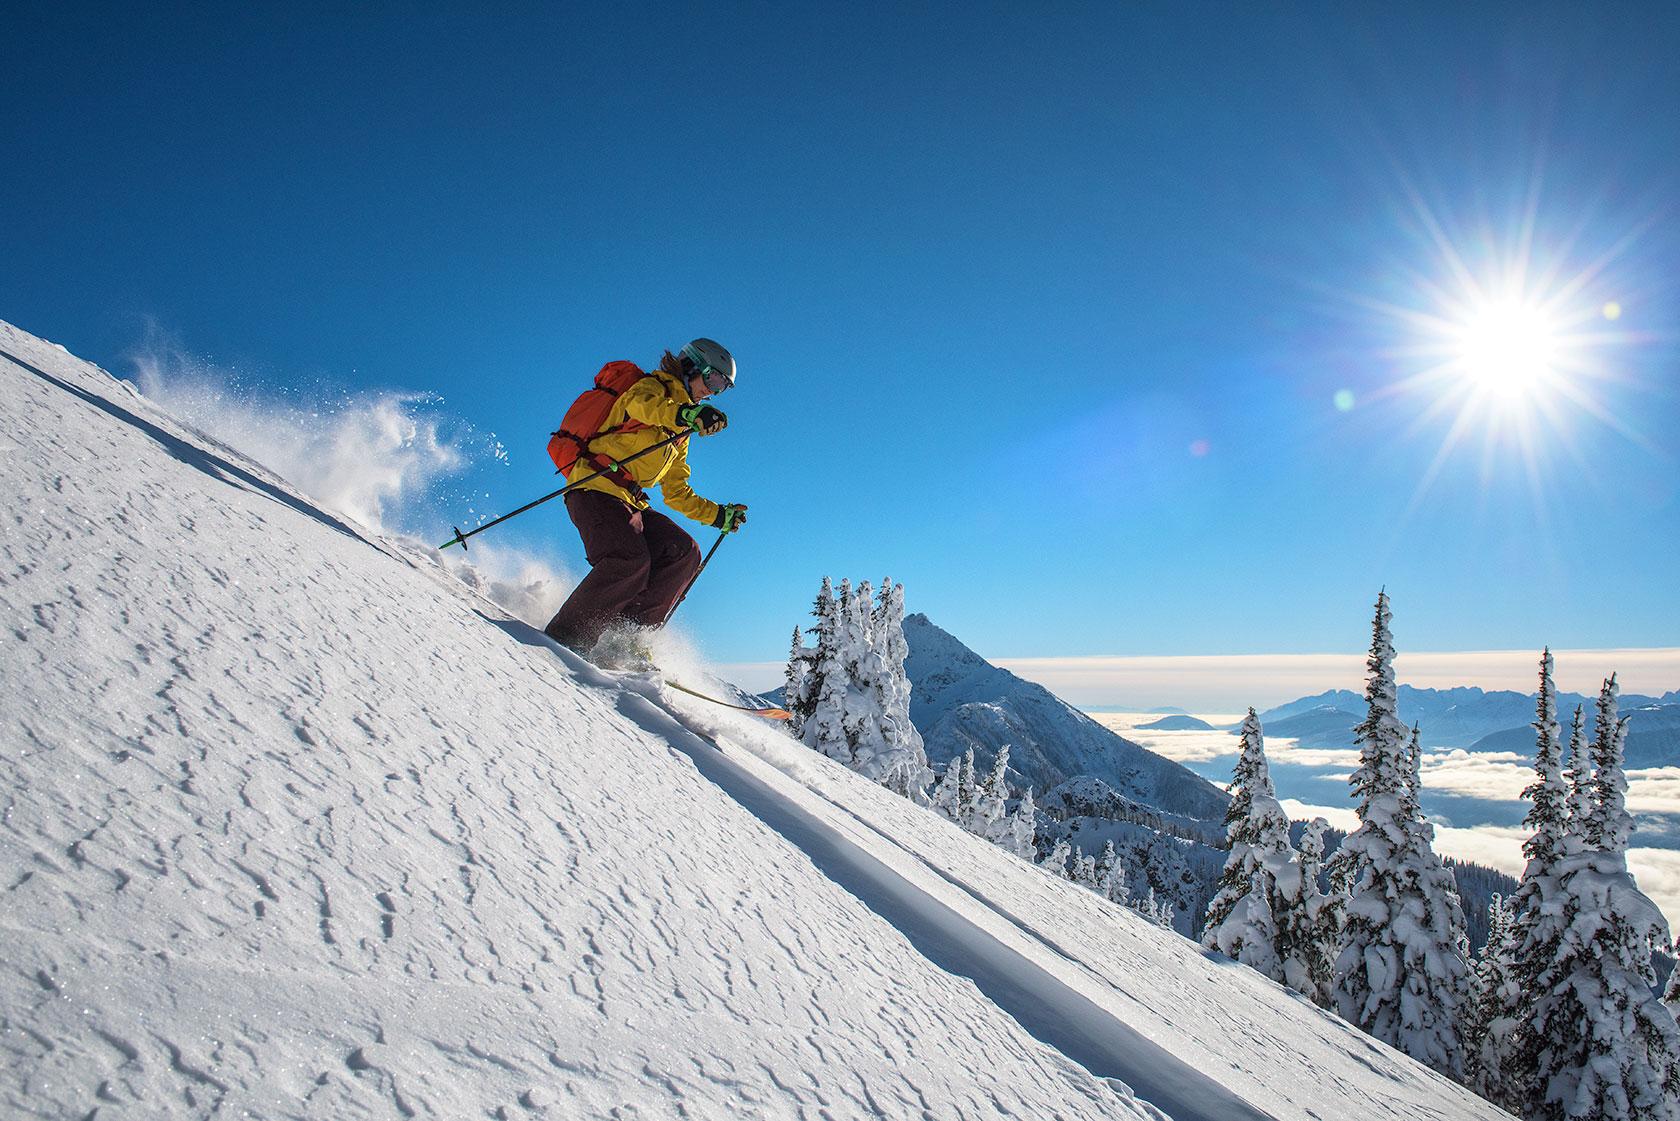 austin-trigg-patagonia-banff-alberta-winter-revelstoke-bc-british-columbia-mountains-valley-snow-skiing-touring-backcountry-adventure-powder-day.jpg